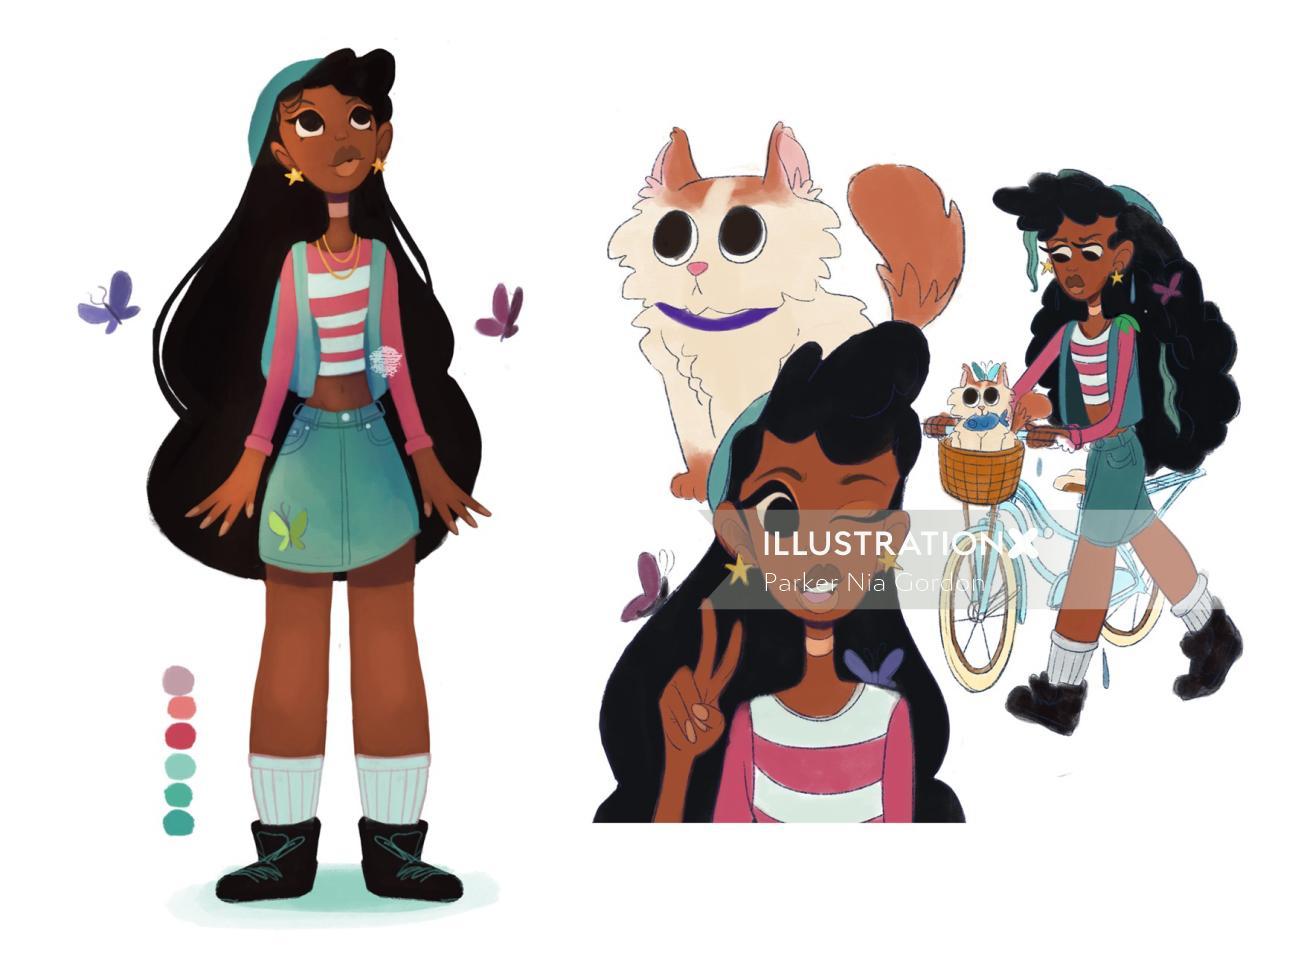 Character design of long hair girl